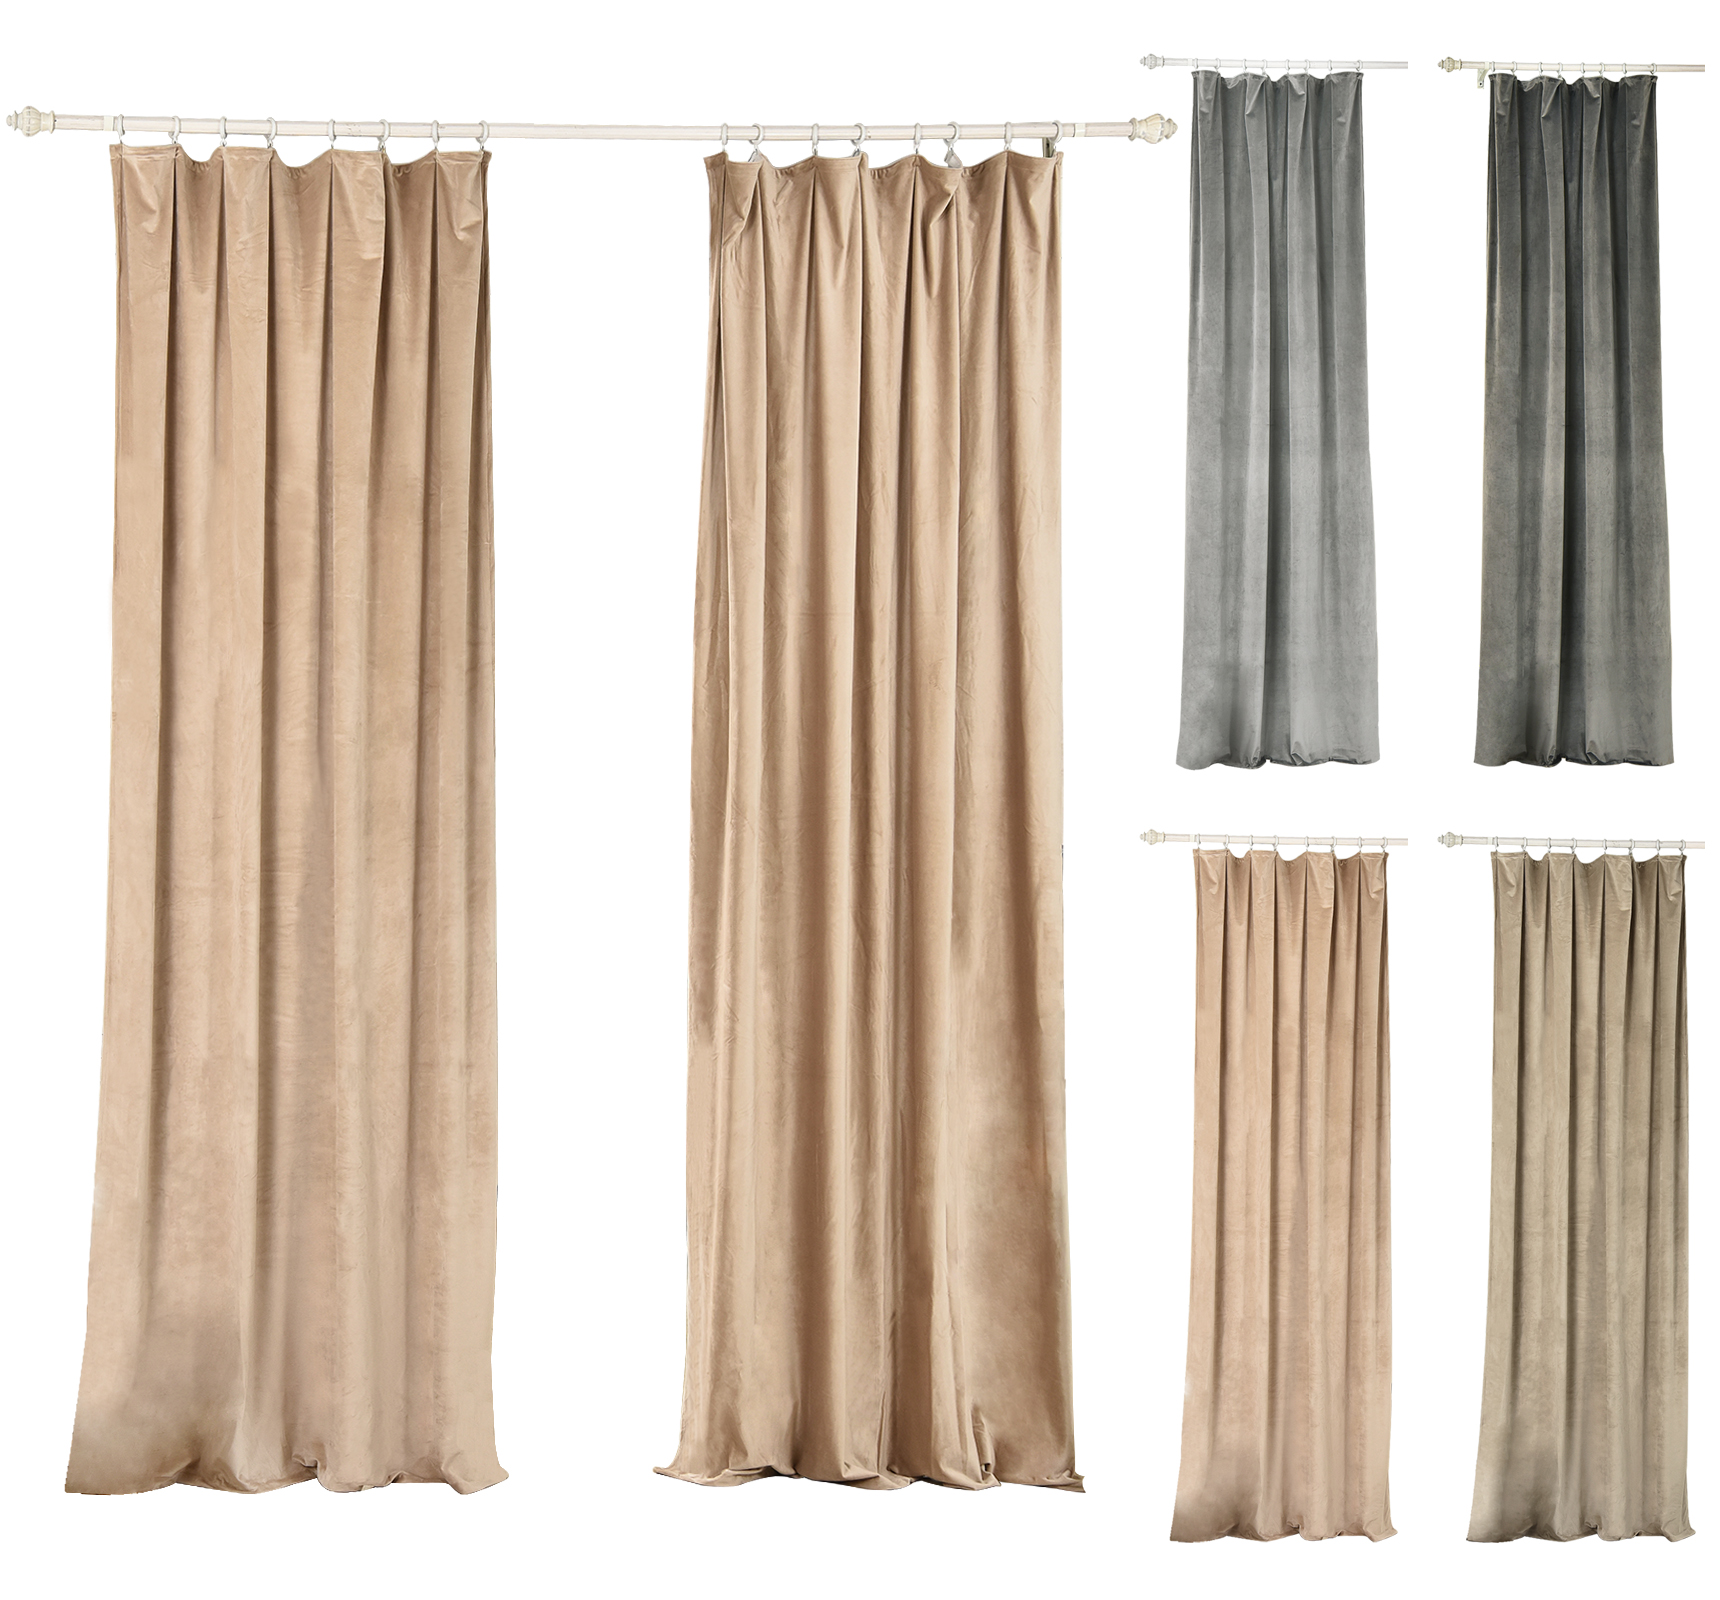 gardinen blickdicht kr uselband beflockte verdunklungsvorhang thermogardine 491 ebay. Black Bedroom Furniture Sets. Home Design Ideas